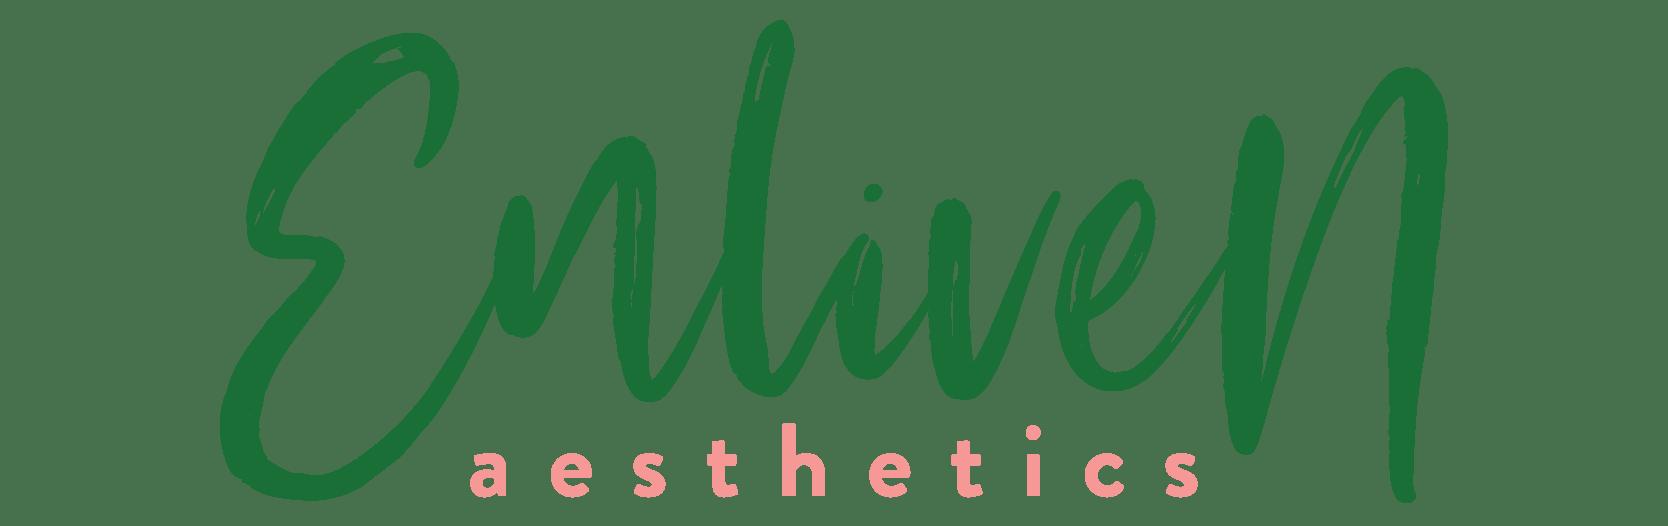 Enliven Aesthetics   Dermal Fillers Specialists in San Diego   Botox, Dysport, Sculptra, Galderma…